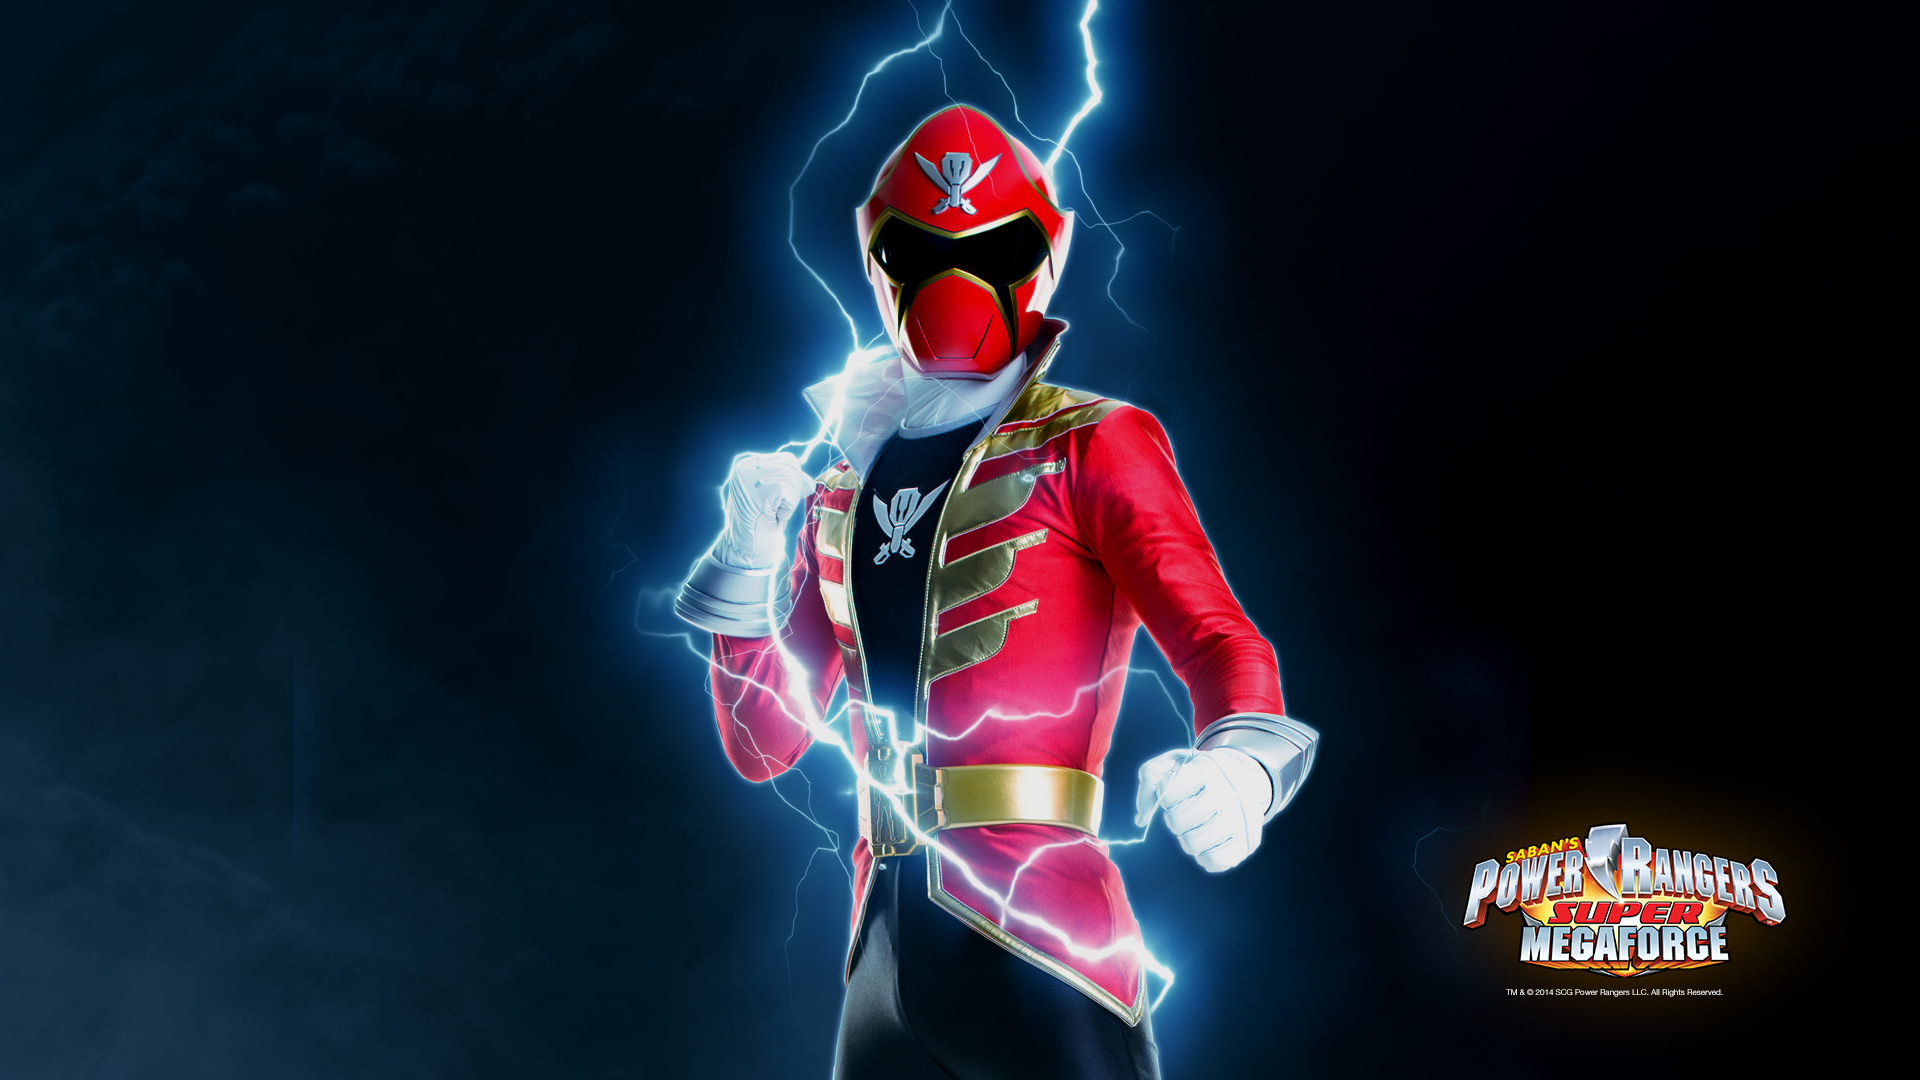 Power rangers super megaforce (3ds1096) download for nintendo.